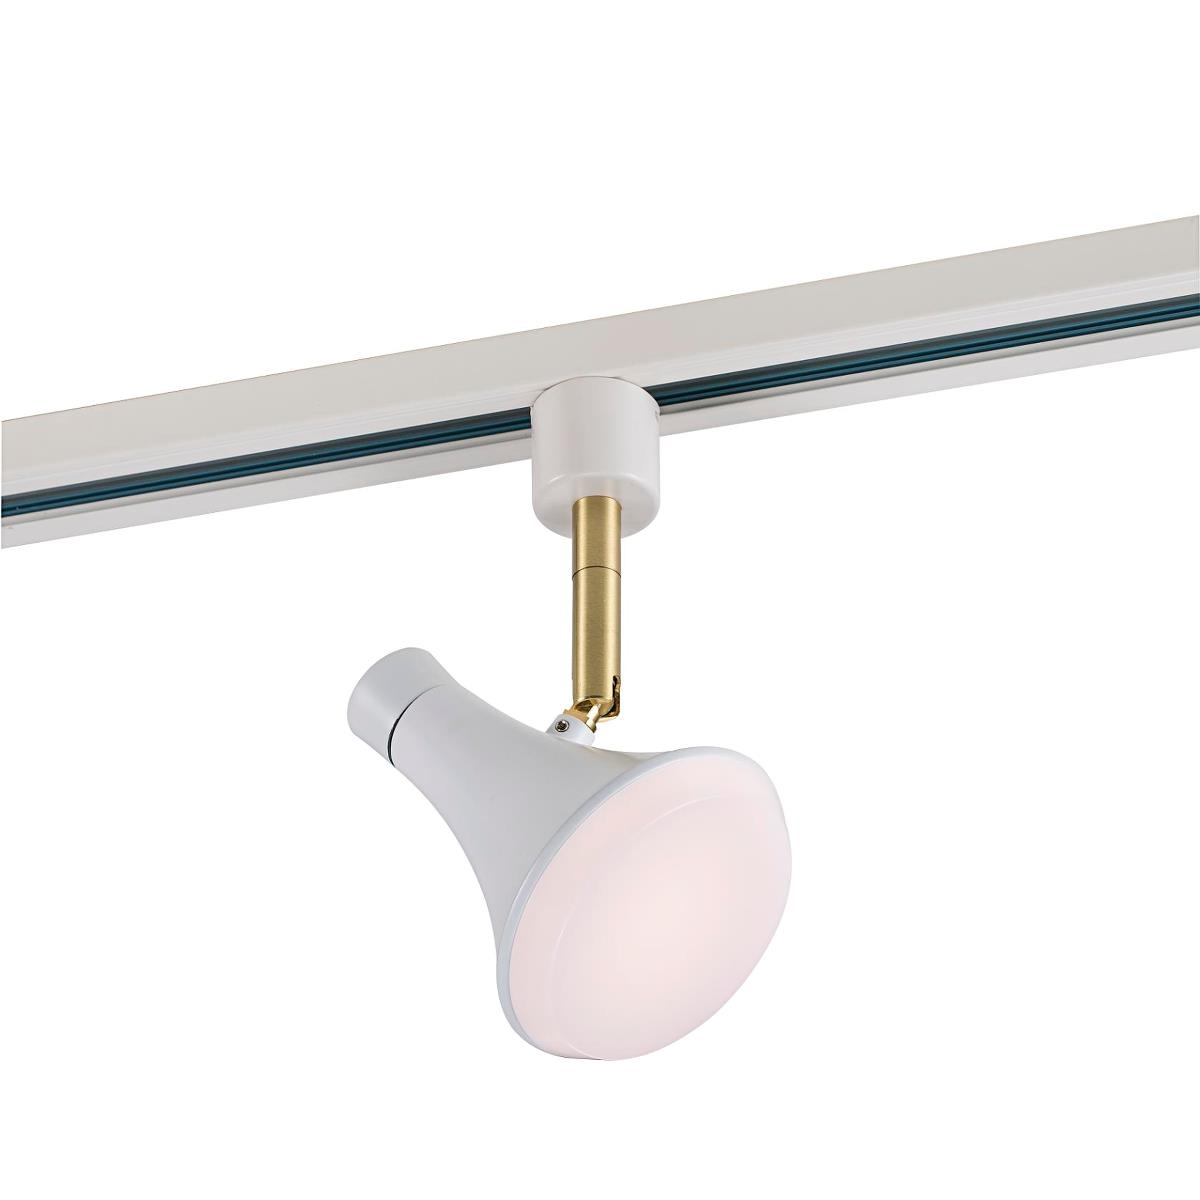 link sleeky loftspot hvid - nordlux fra nordlux